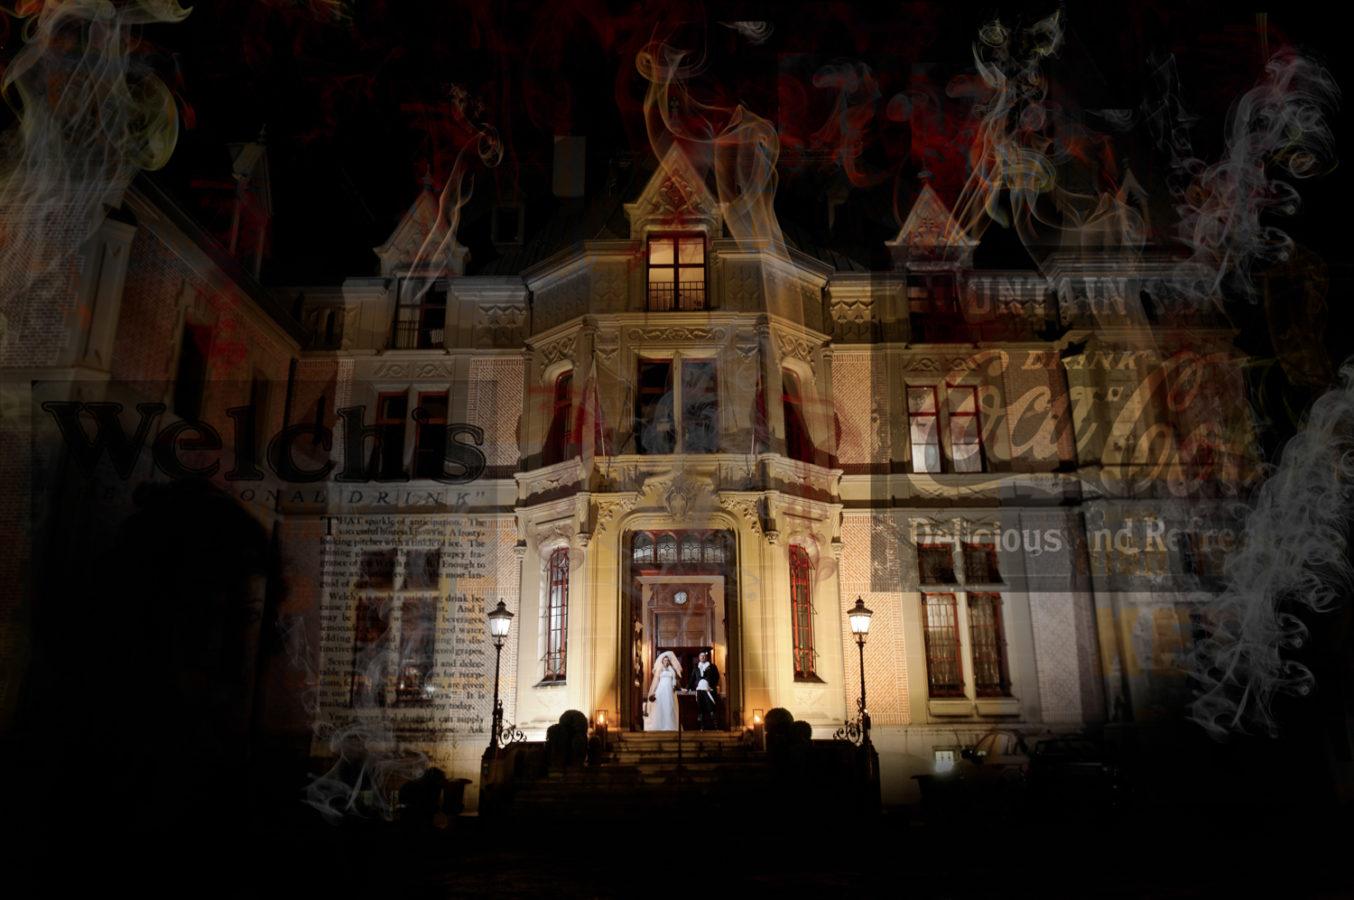 Steam Punk Fotoshooting, Hochzeitsfotograf Thun, Hochzeit Schloss Schadau, Steam Punk Hochzeit im Schloss Schadau